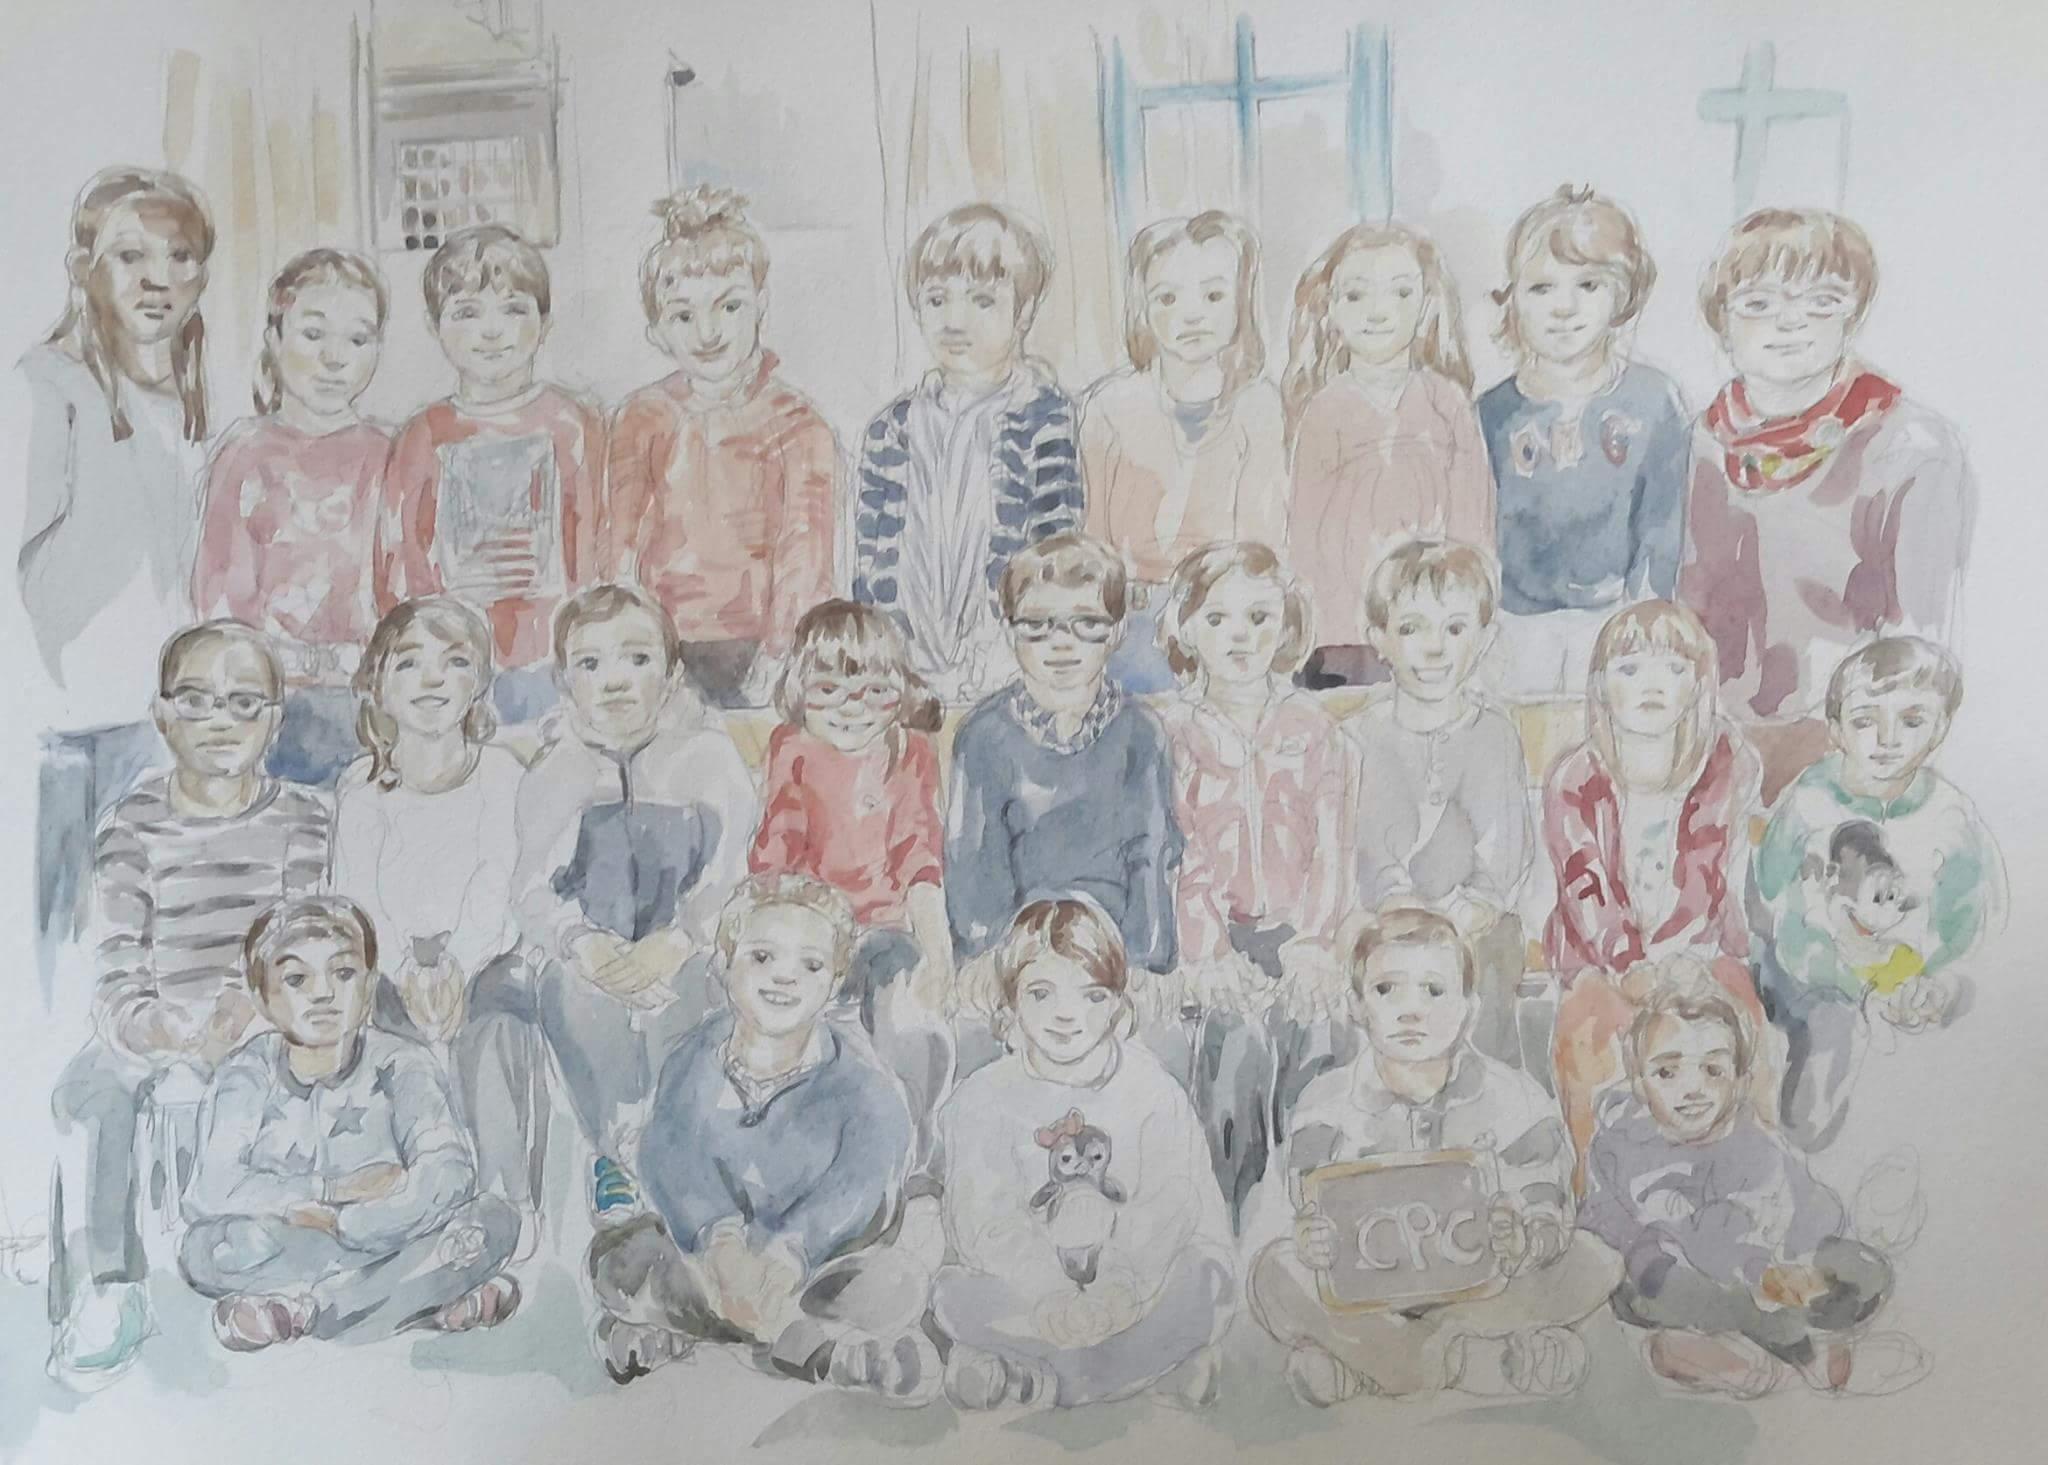 Charlie 4 classe : illustration aquarelle